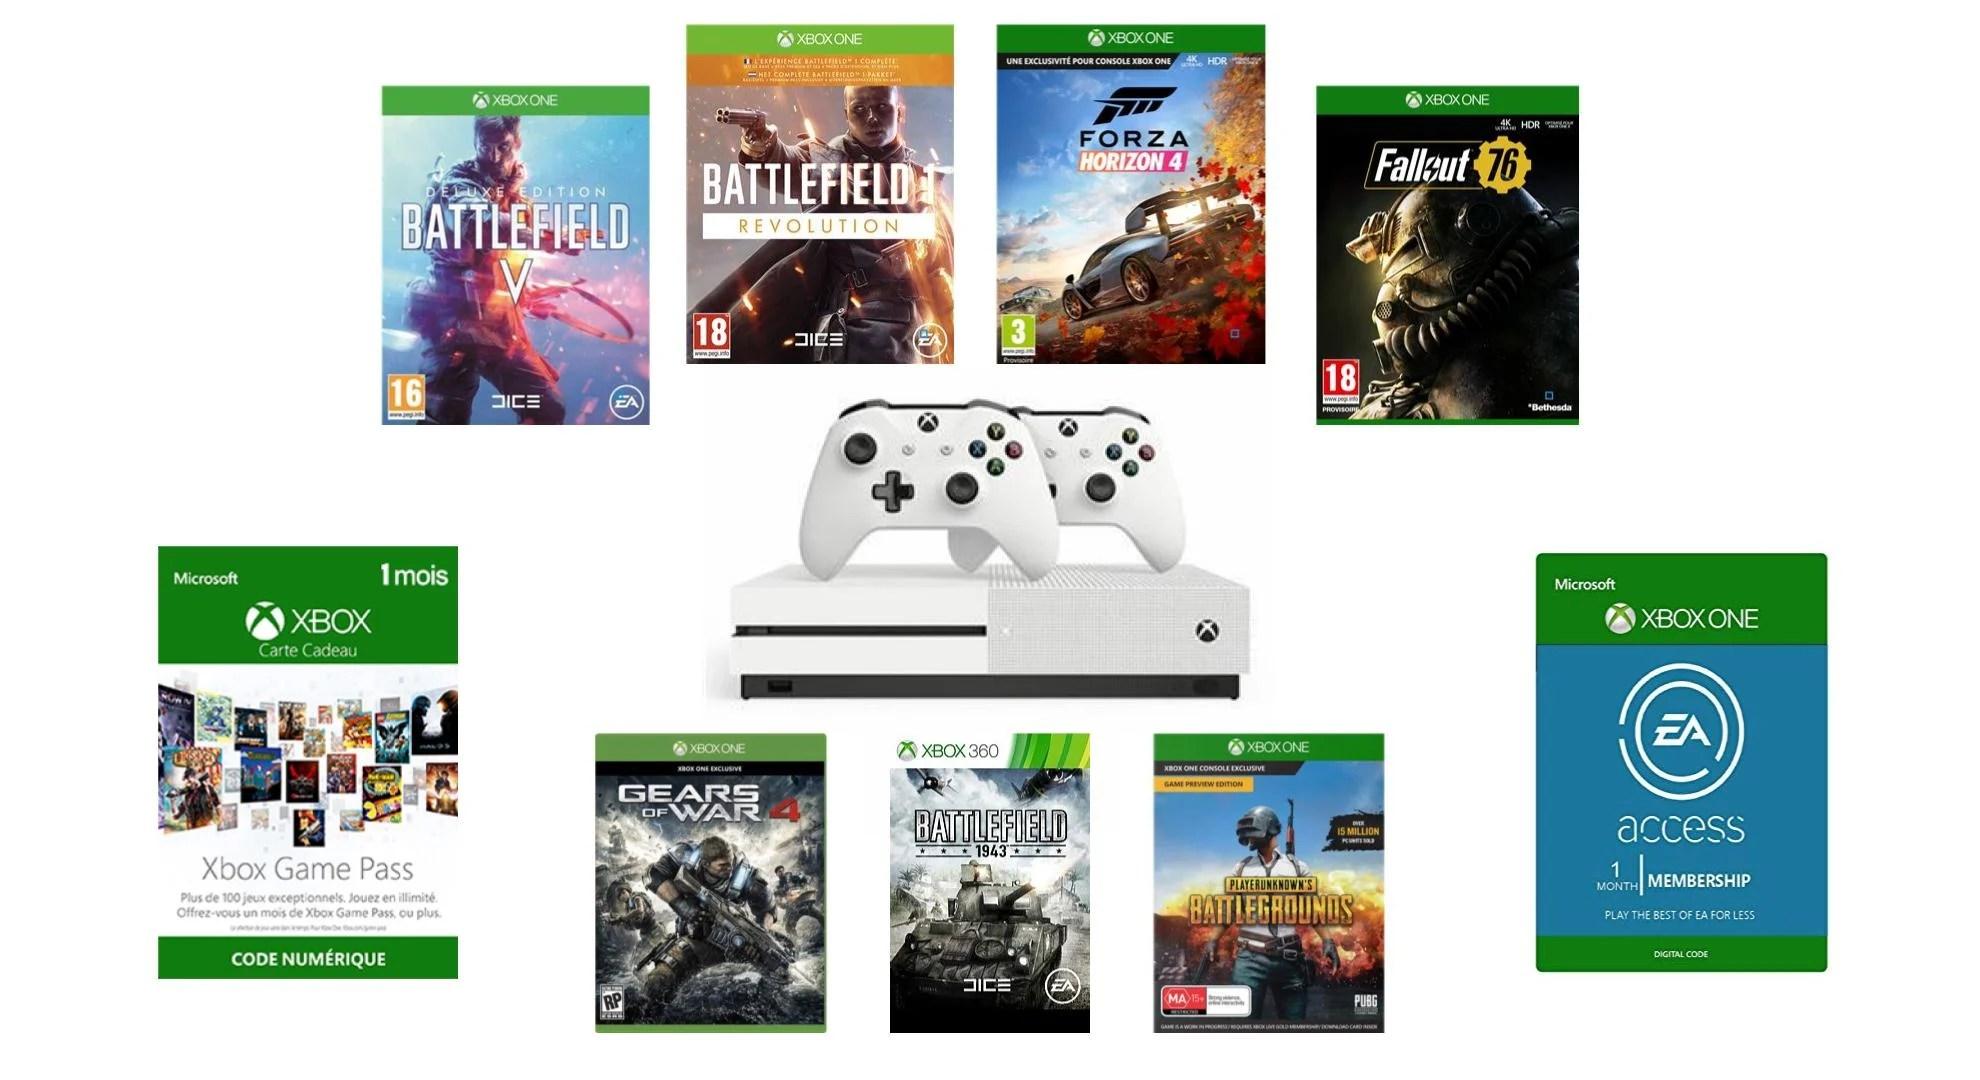 🔥 Bon plan : méga pack Xbox One S 1 To 2 manettes + 7 jeux à 249 euros